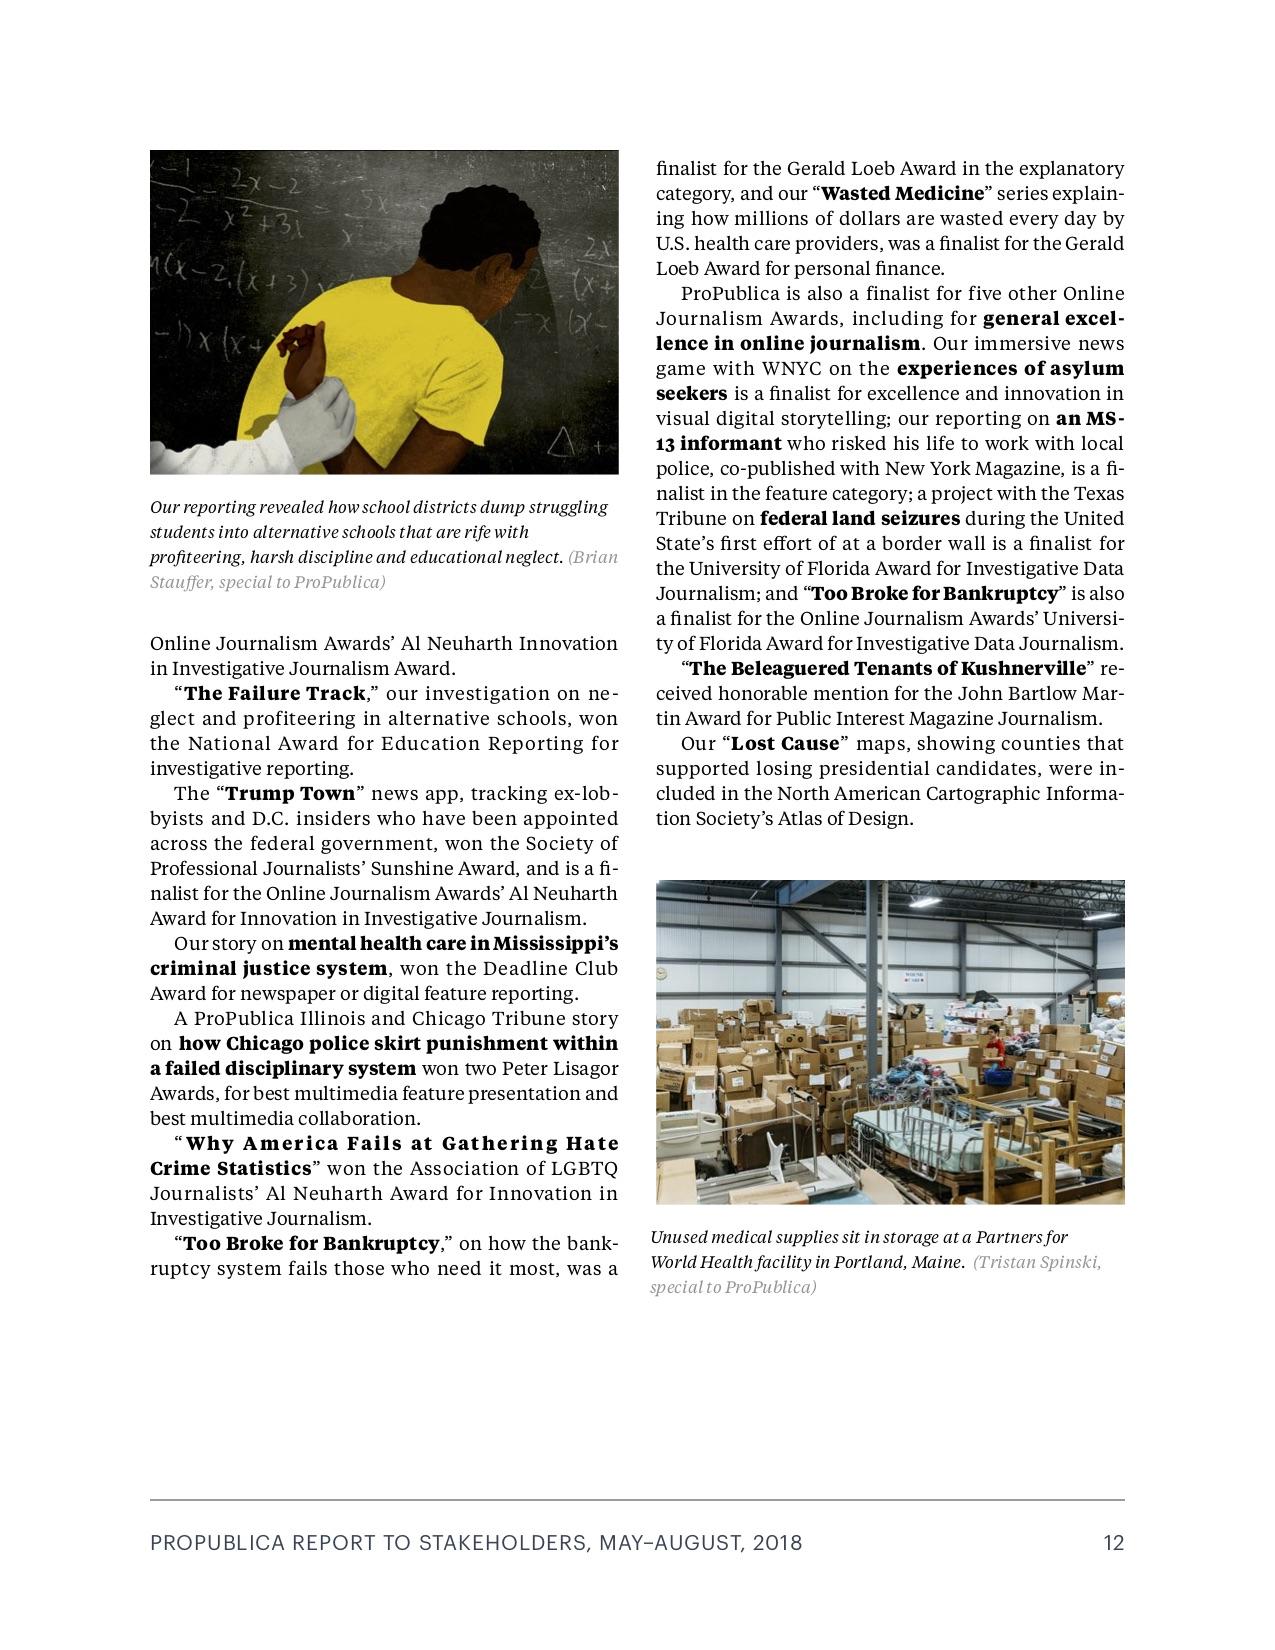 propublica-2018-2nd-interim-report 2 (dragged) 2.jpg